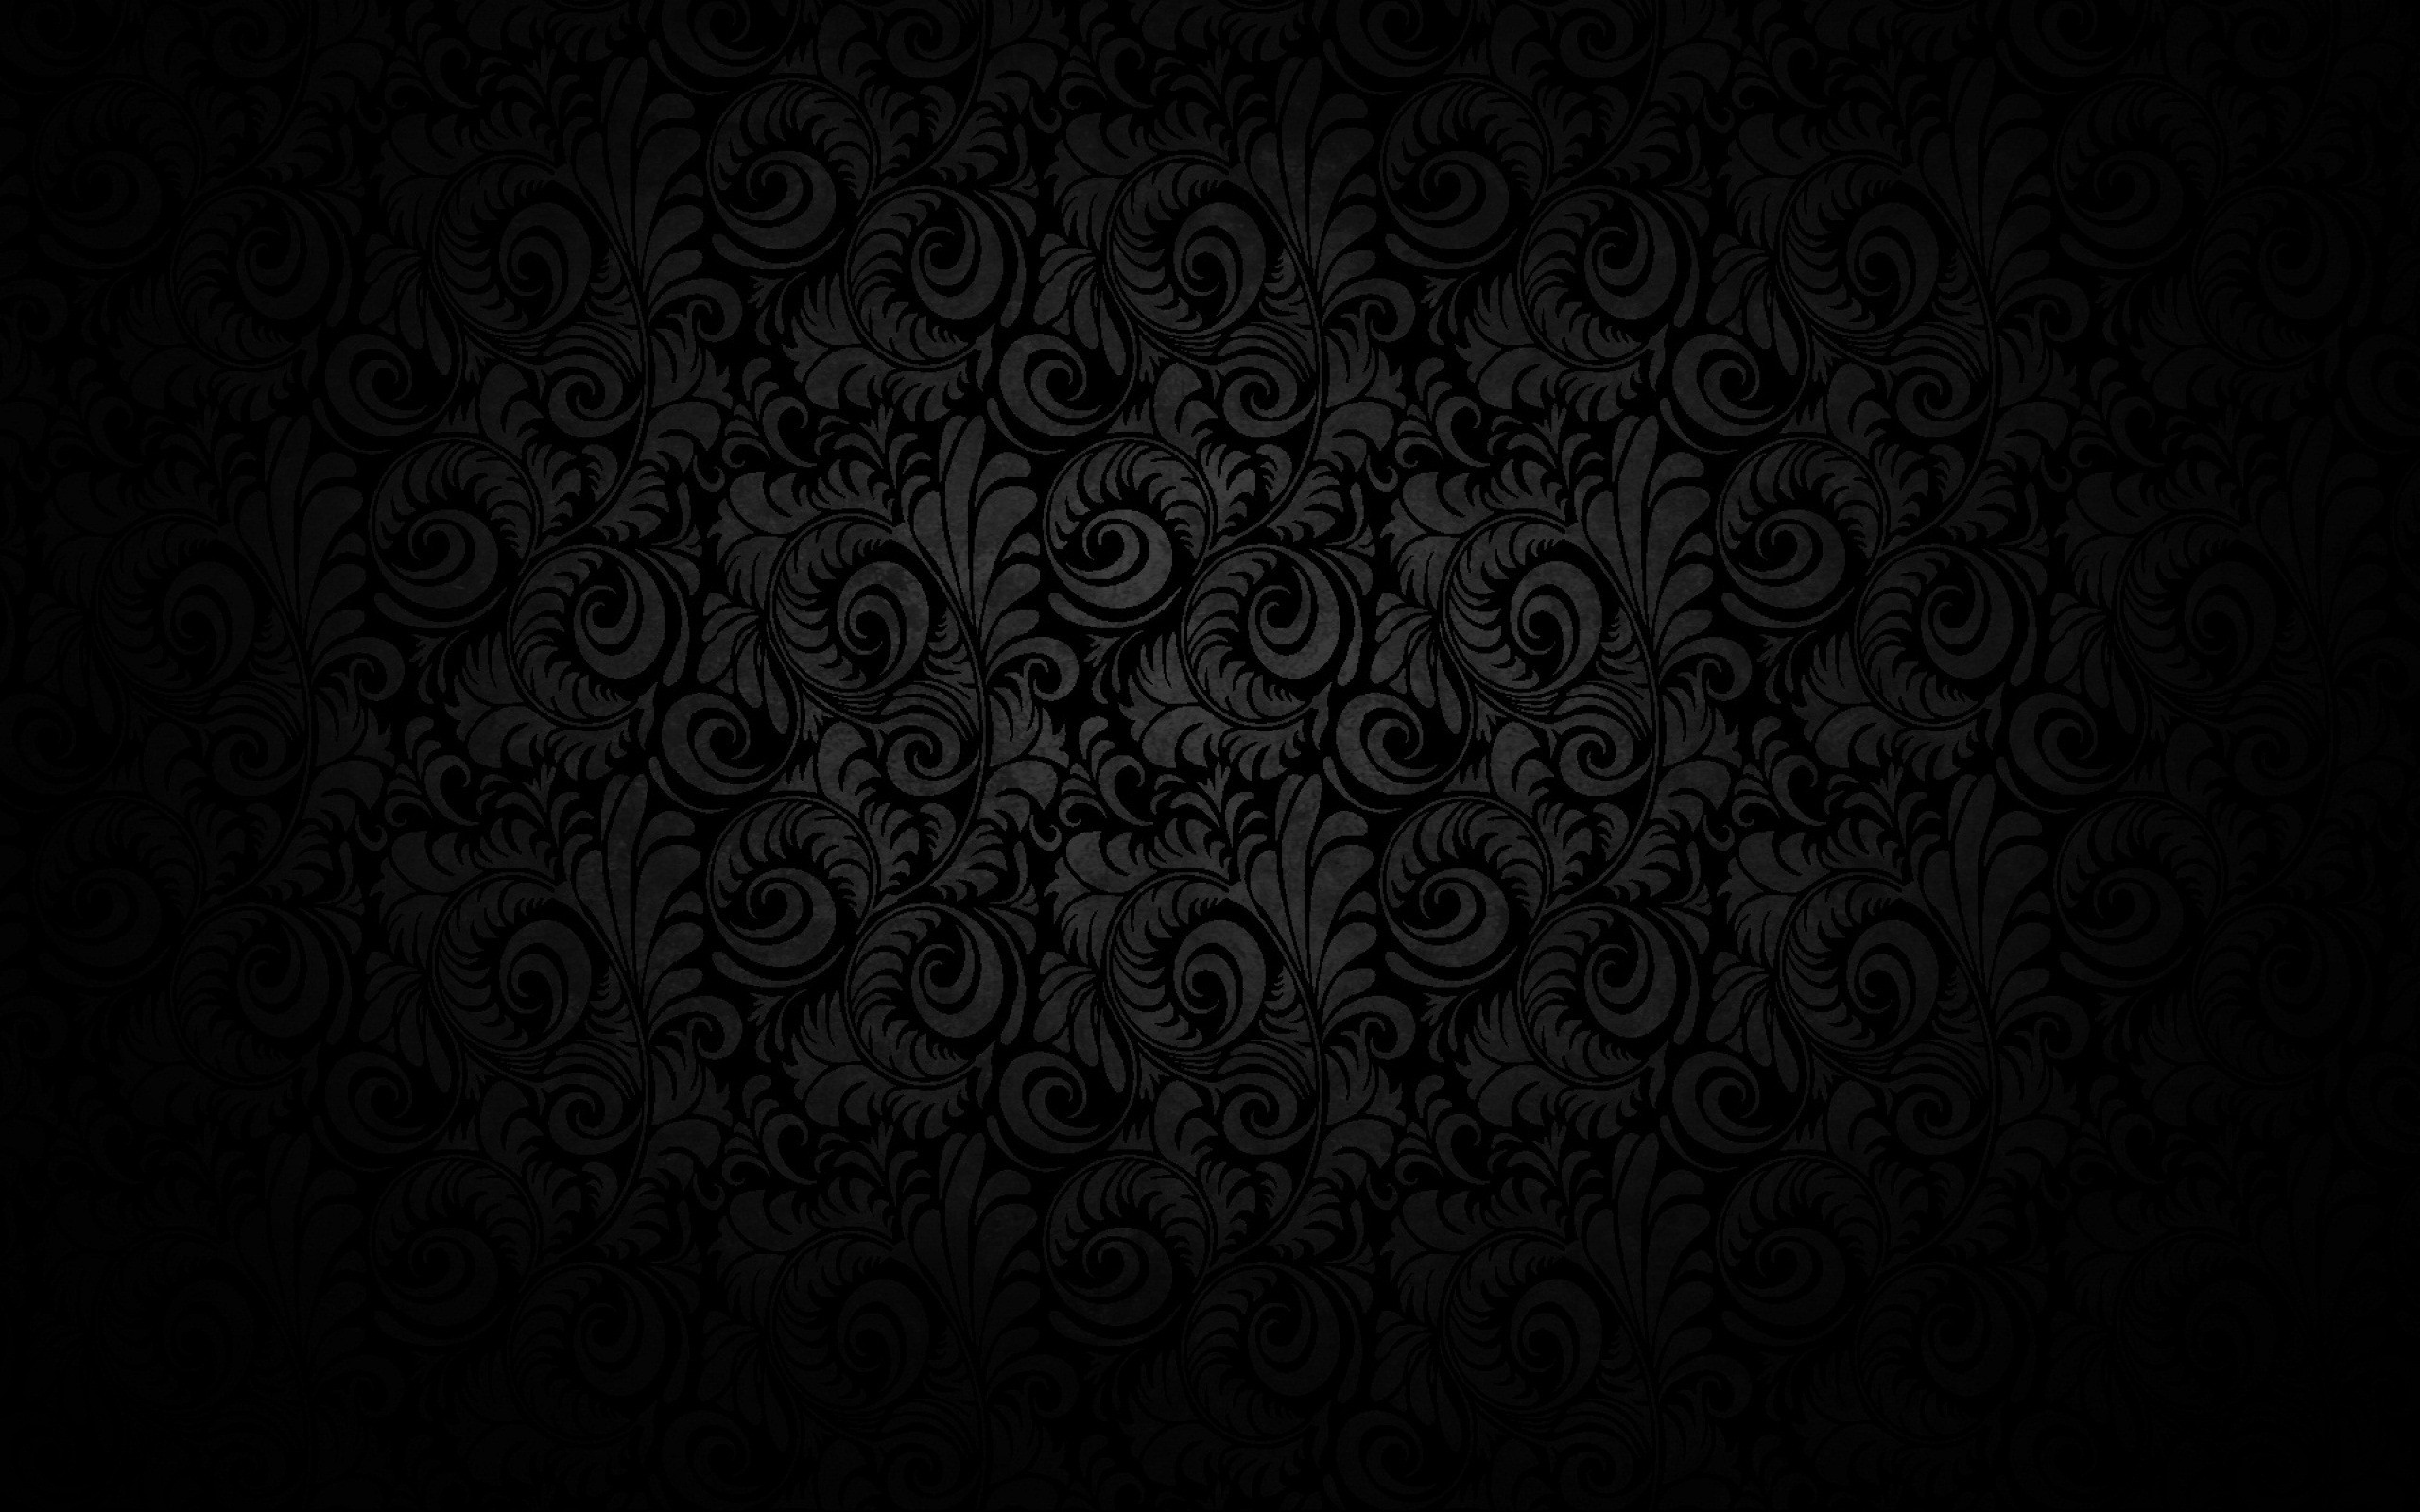 77 Cool Black Background Designs On Wallpapersafari